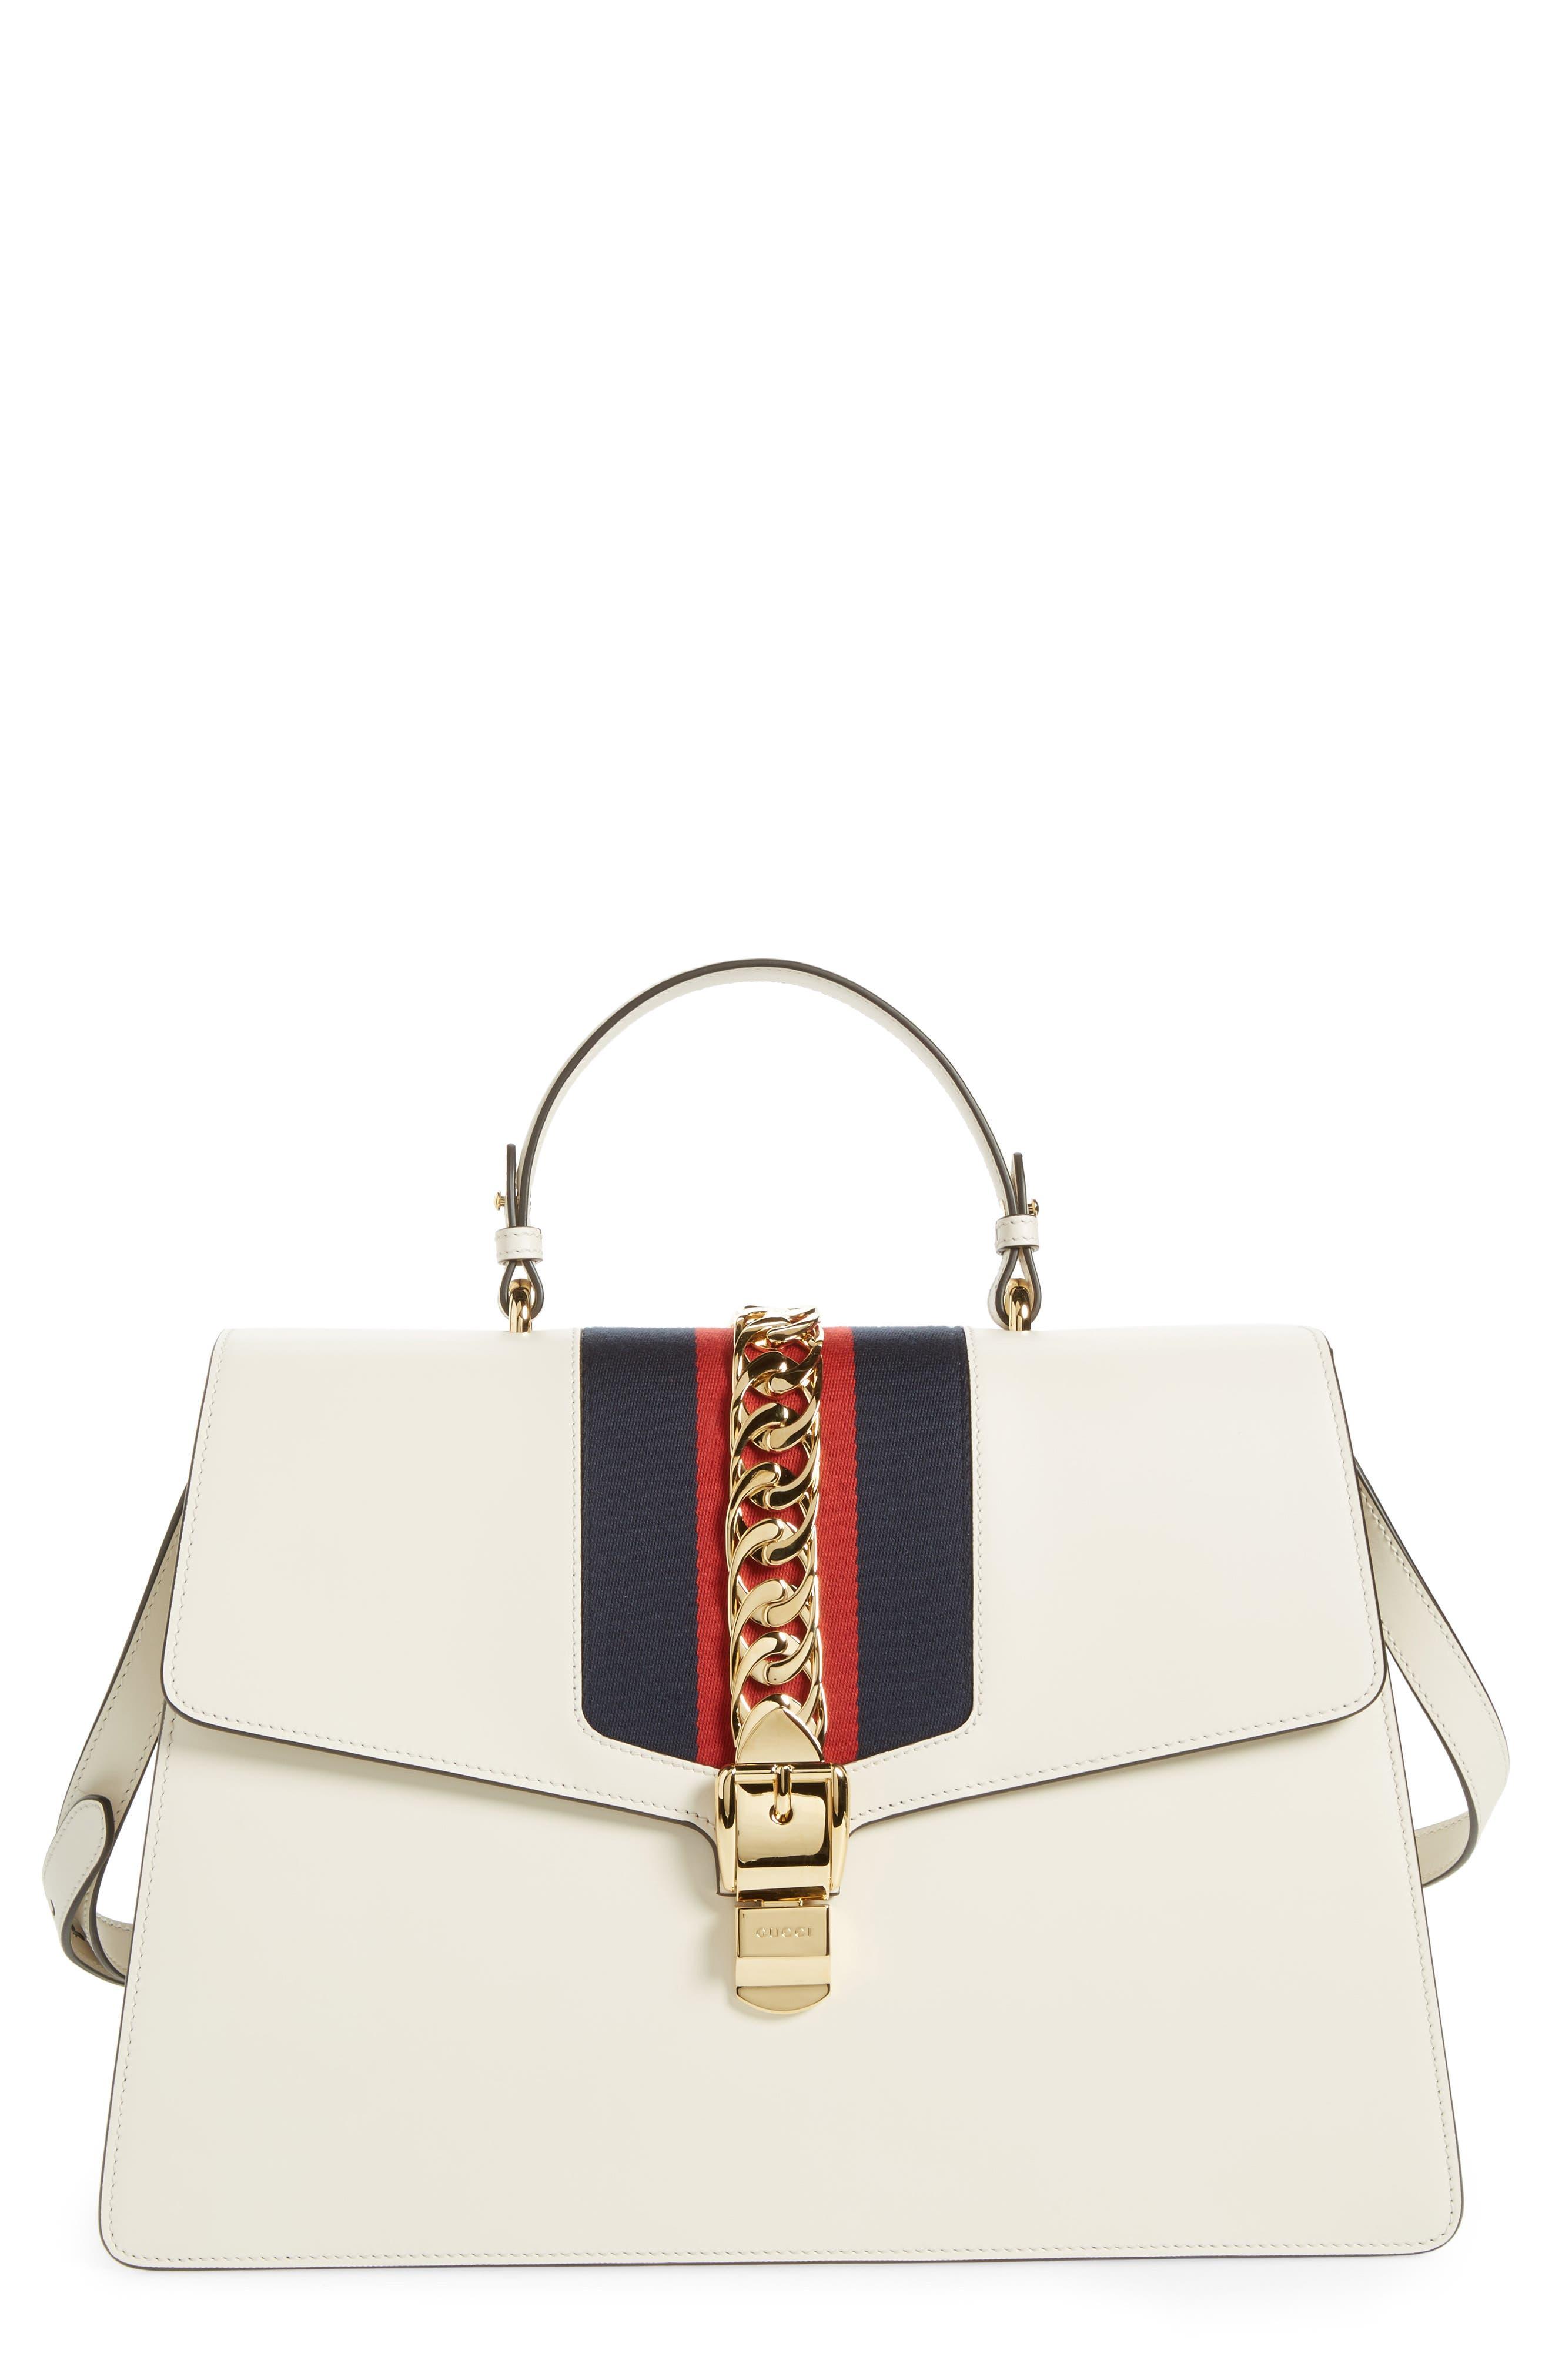 Maxi Sylvie Top Handle Leather Shoulder Bag,                             Main thumbnail 1, color,                             MYSTIC WHITE/ BLUE RED